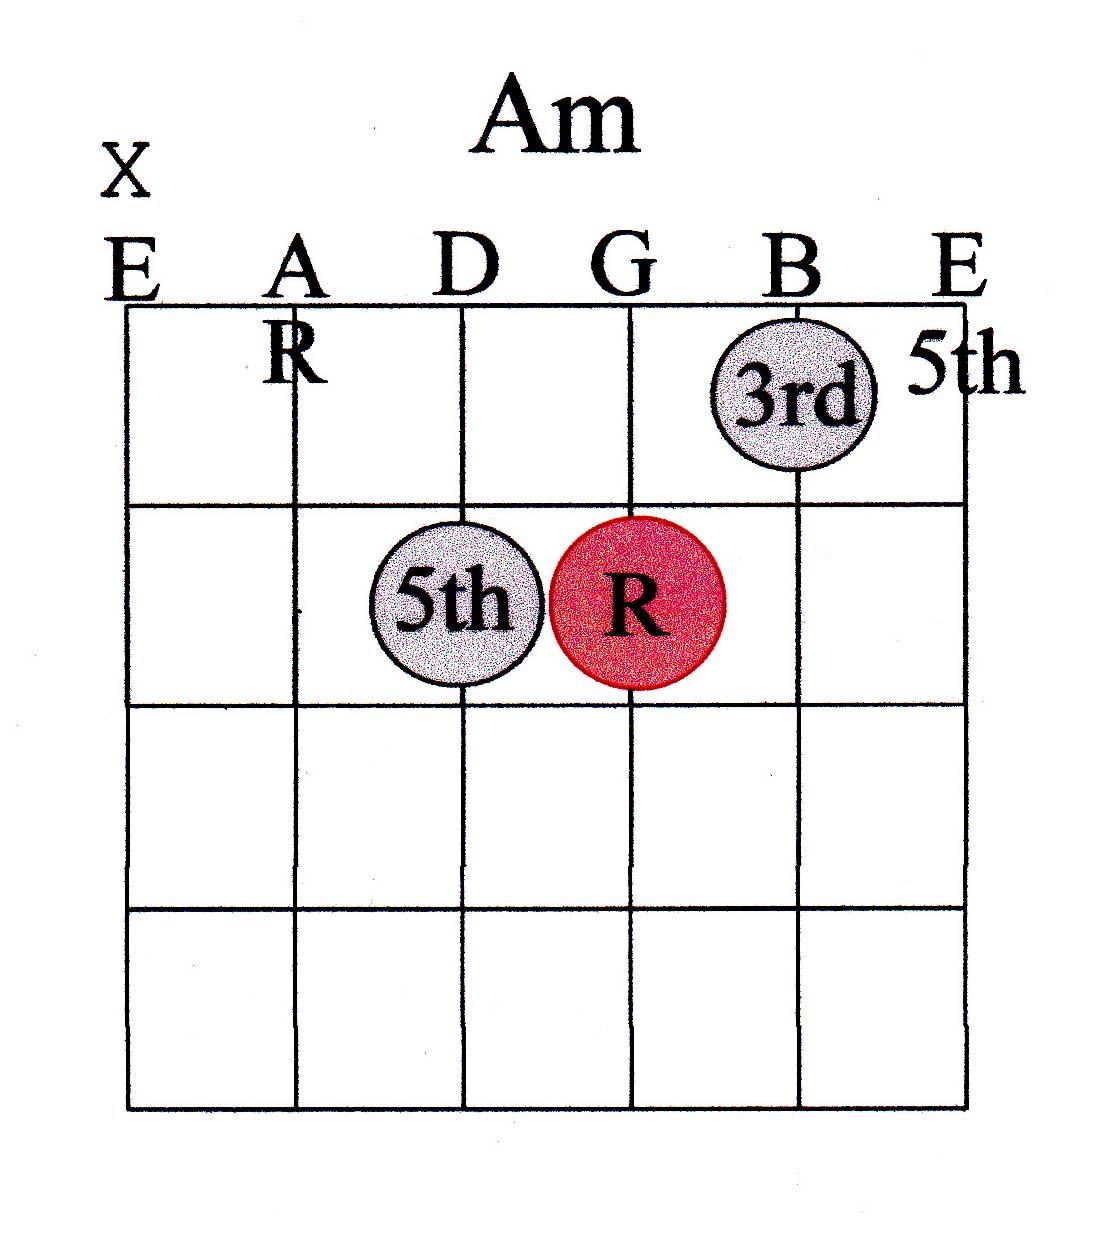 guitar chord guide beginner marcus curtis music. Black Bedroom Furniture Sets. Home Design Ideas